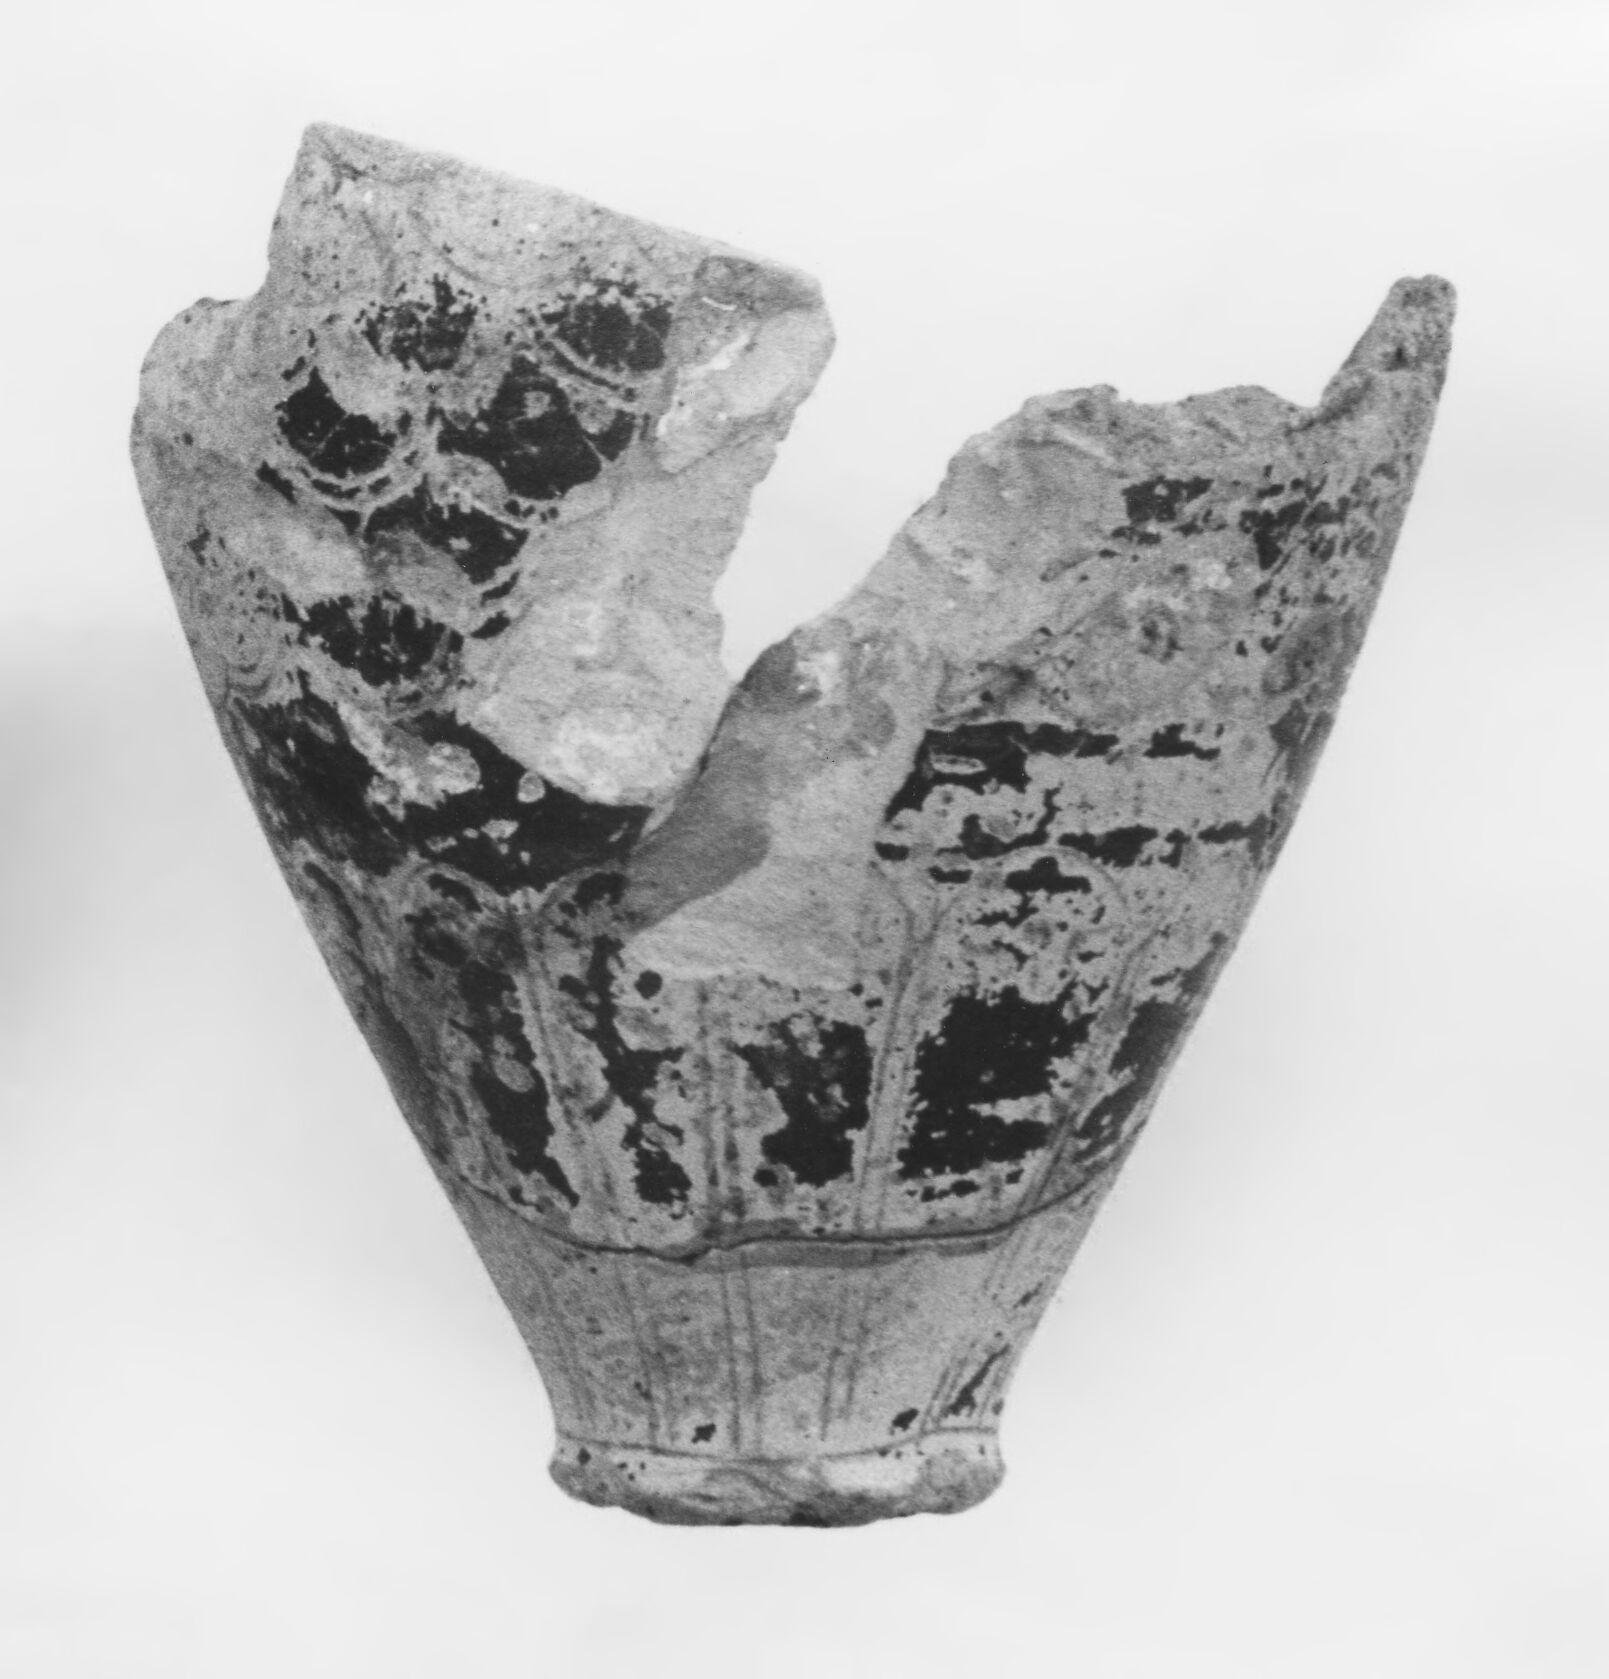 Lower Portion of a Late Protocorinthian Piriform Aryballos